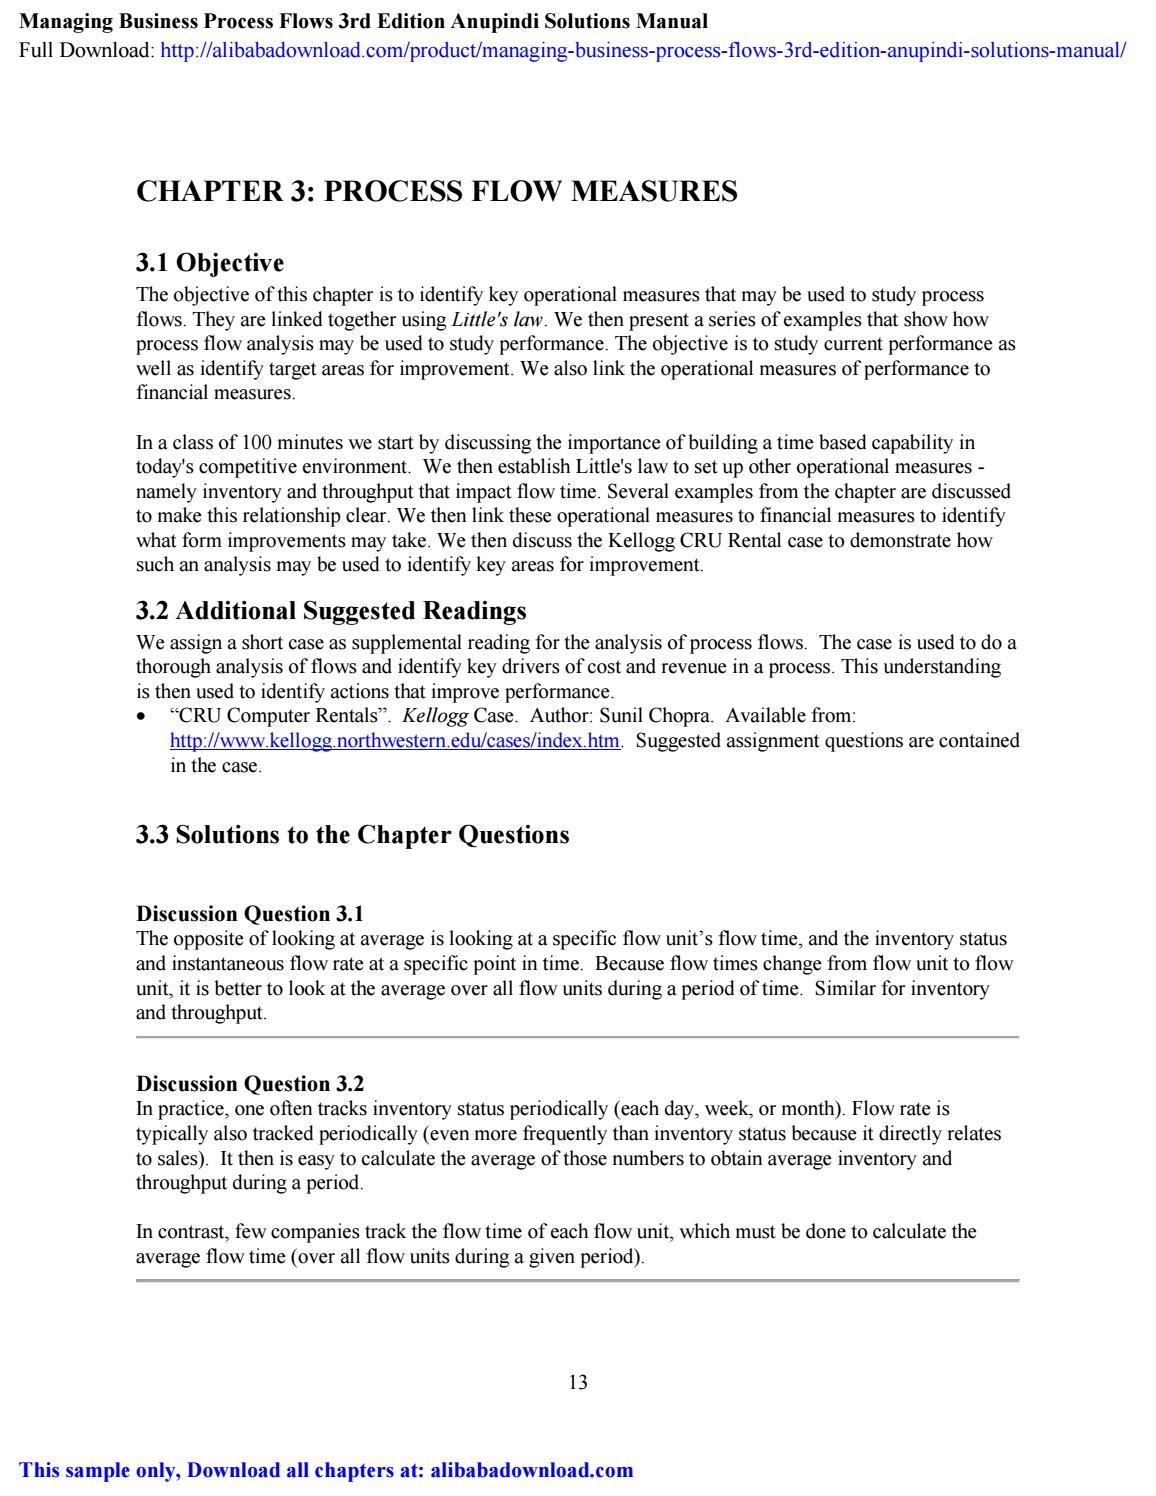 Managing Business Process Flows 3rd Edition Anupindi